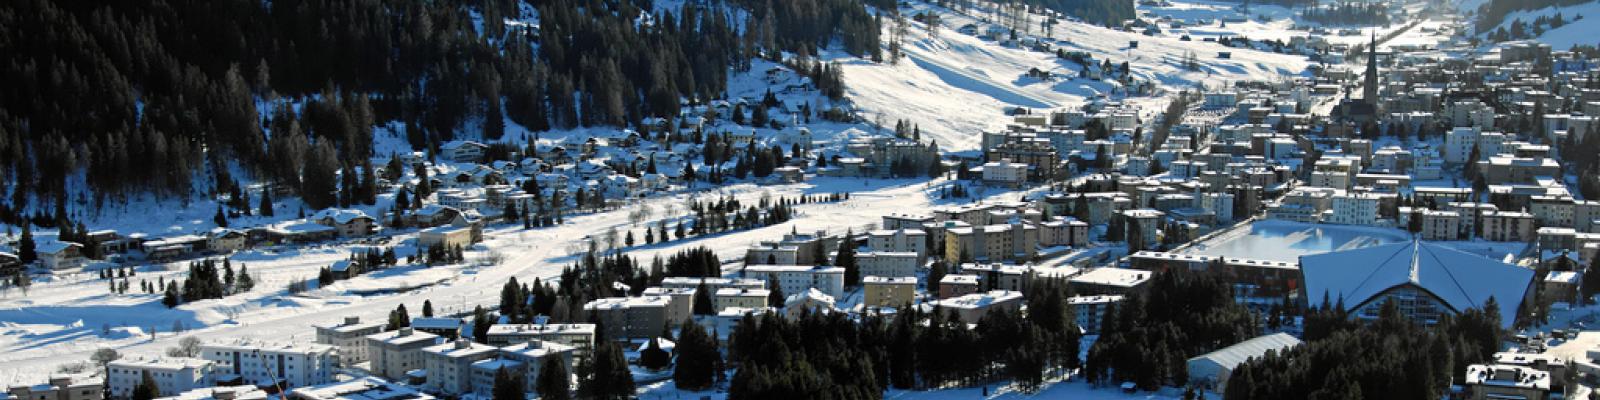 Davos (World Economic Forum 2011)